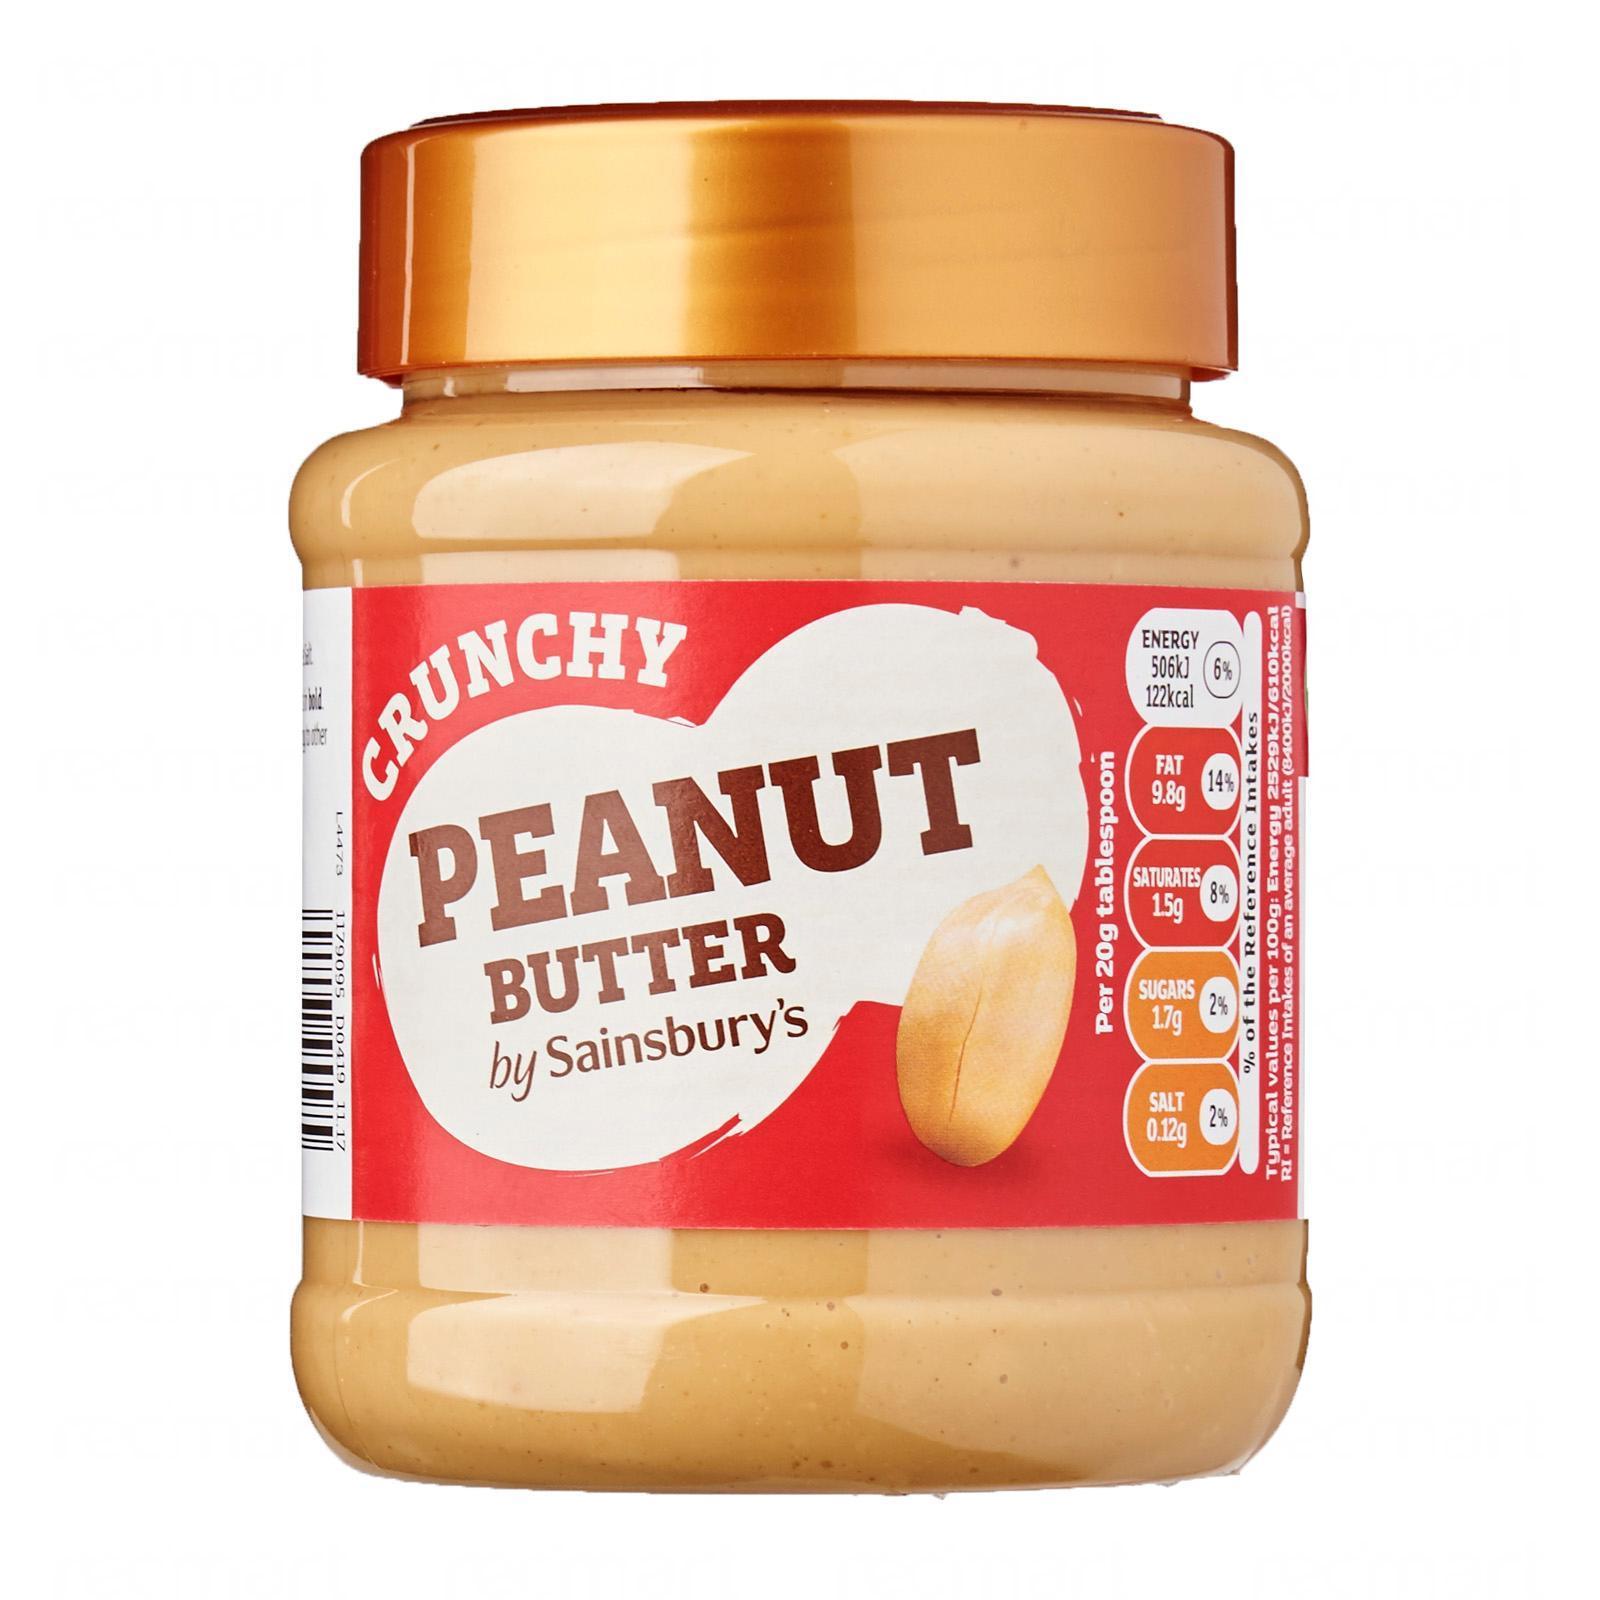 Sainsbury's Crunchy Peanut Butter